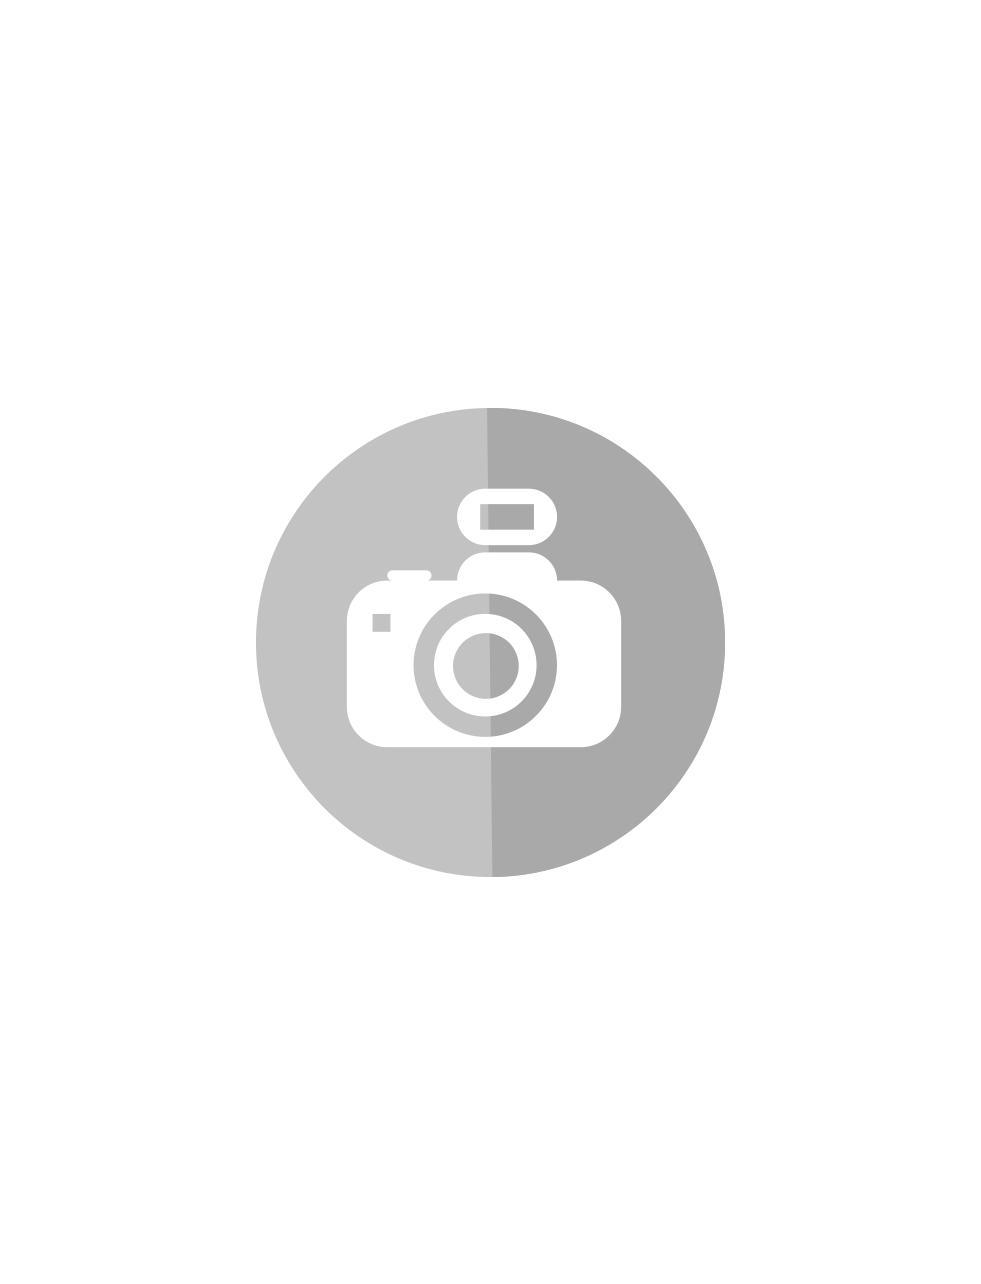 30086122_sparepart/Eisschloss-Höhle-Socke